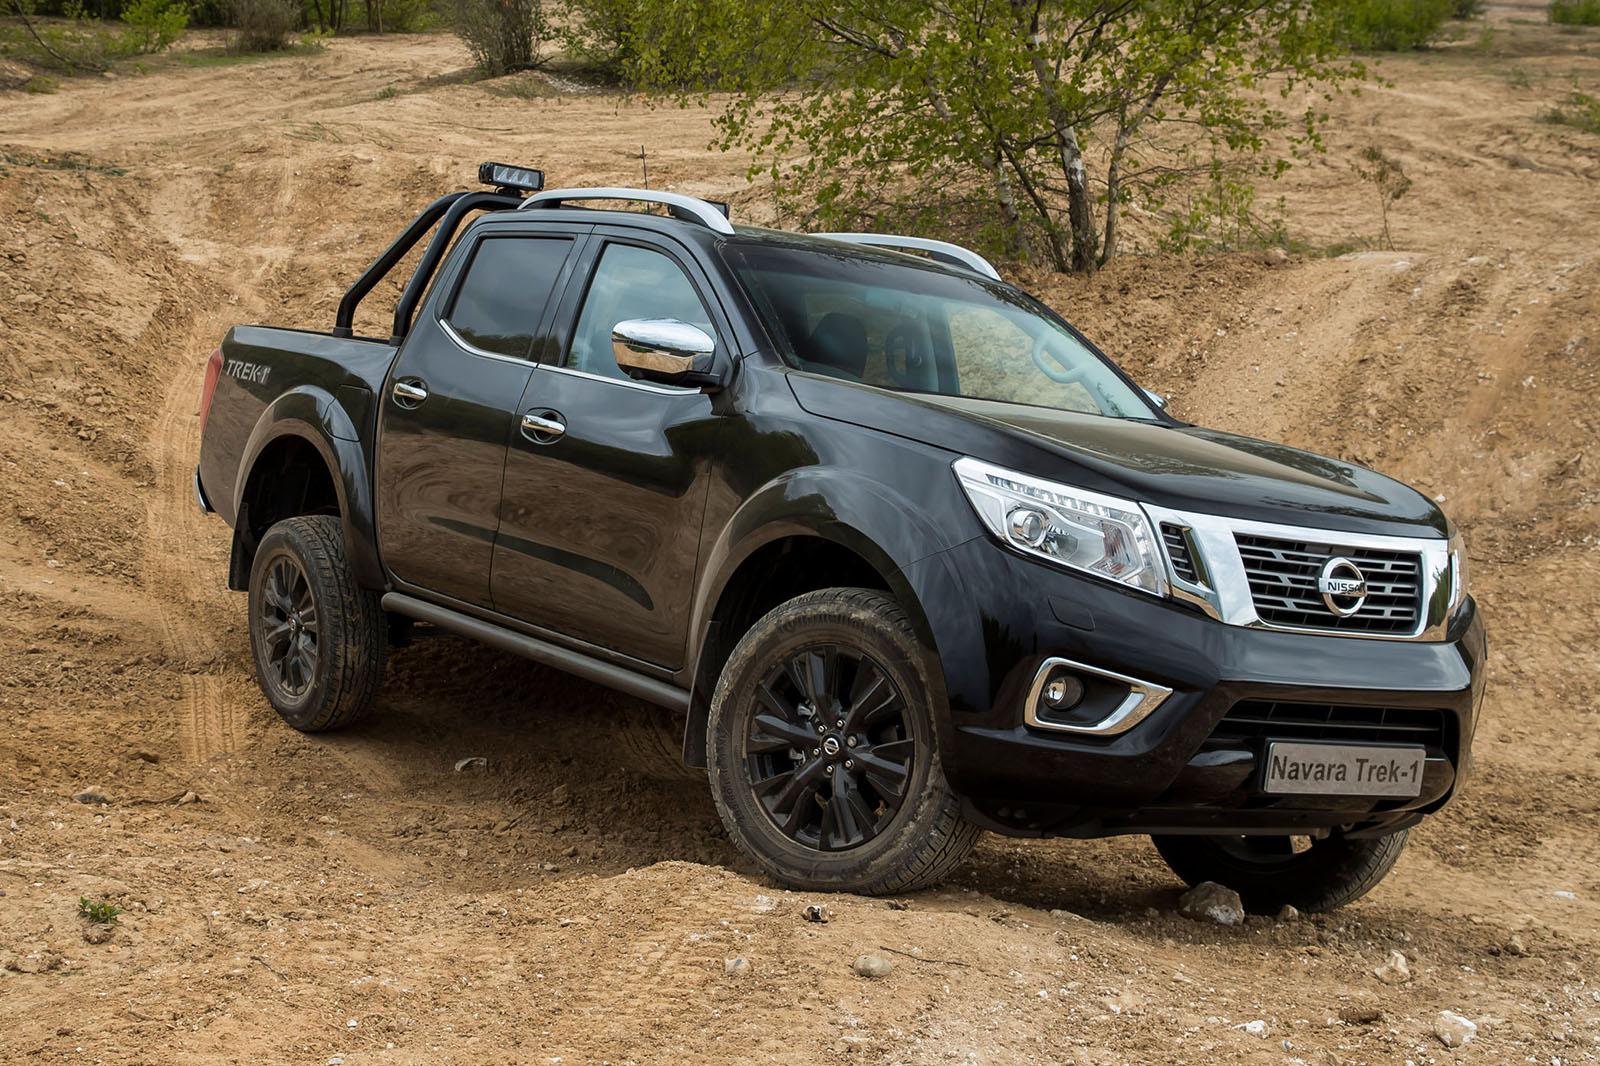 Nissan Navara Trek-1° 2017 review | Autocar